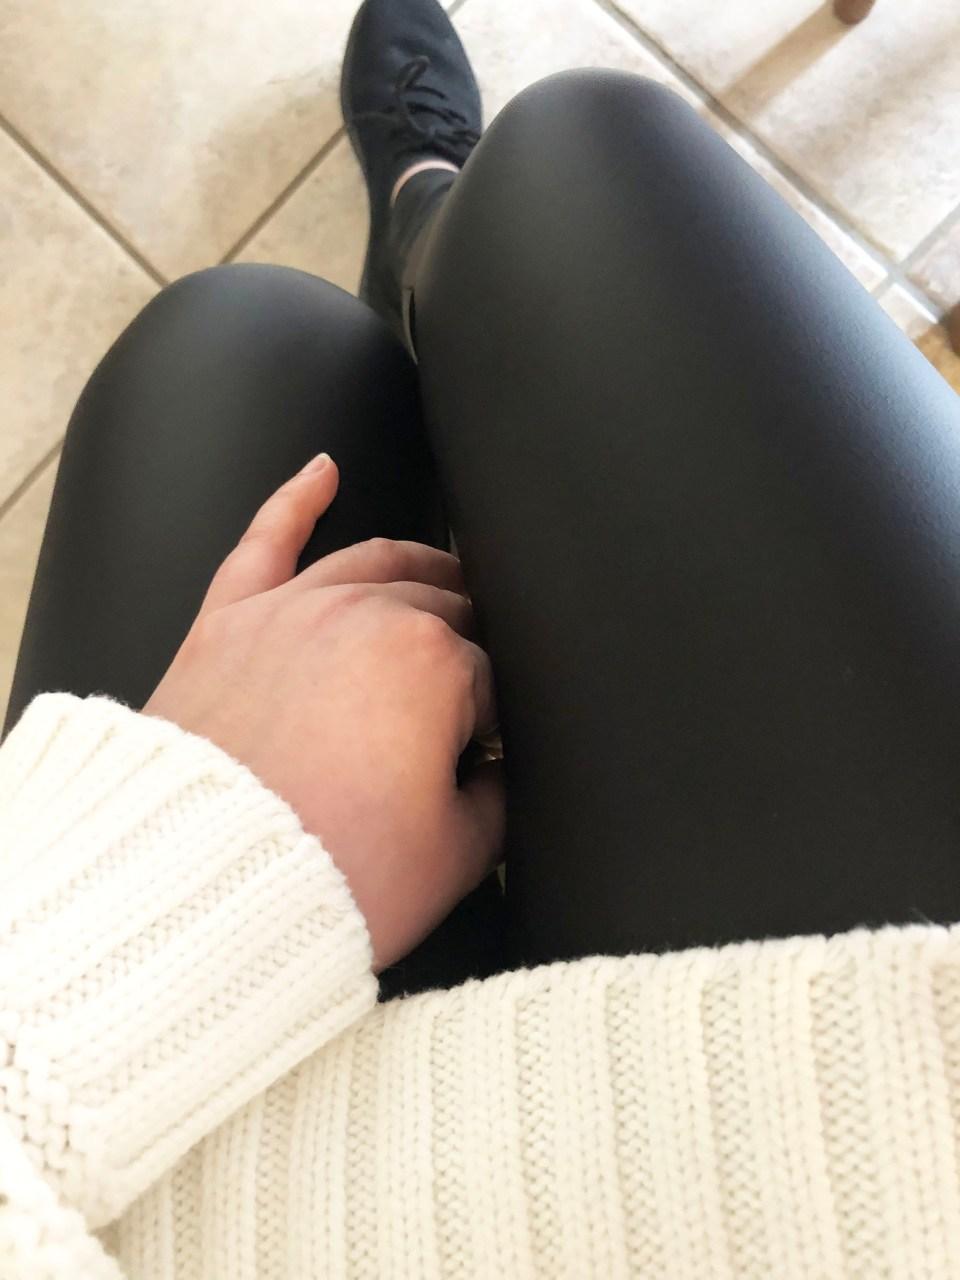 Loopstripe Sweater + Faux Leather Leggings 13